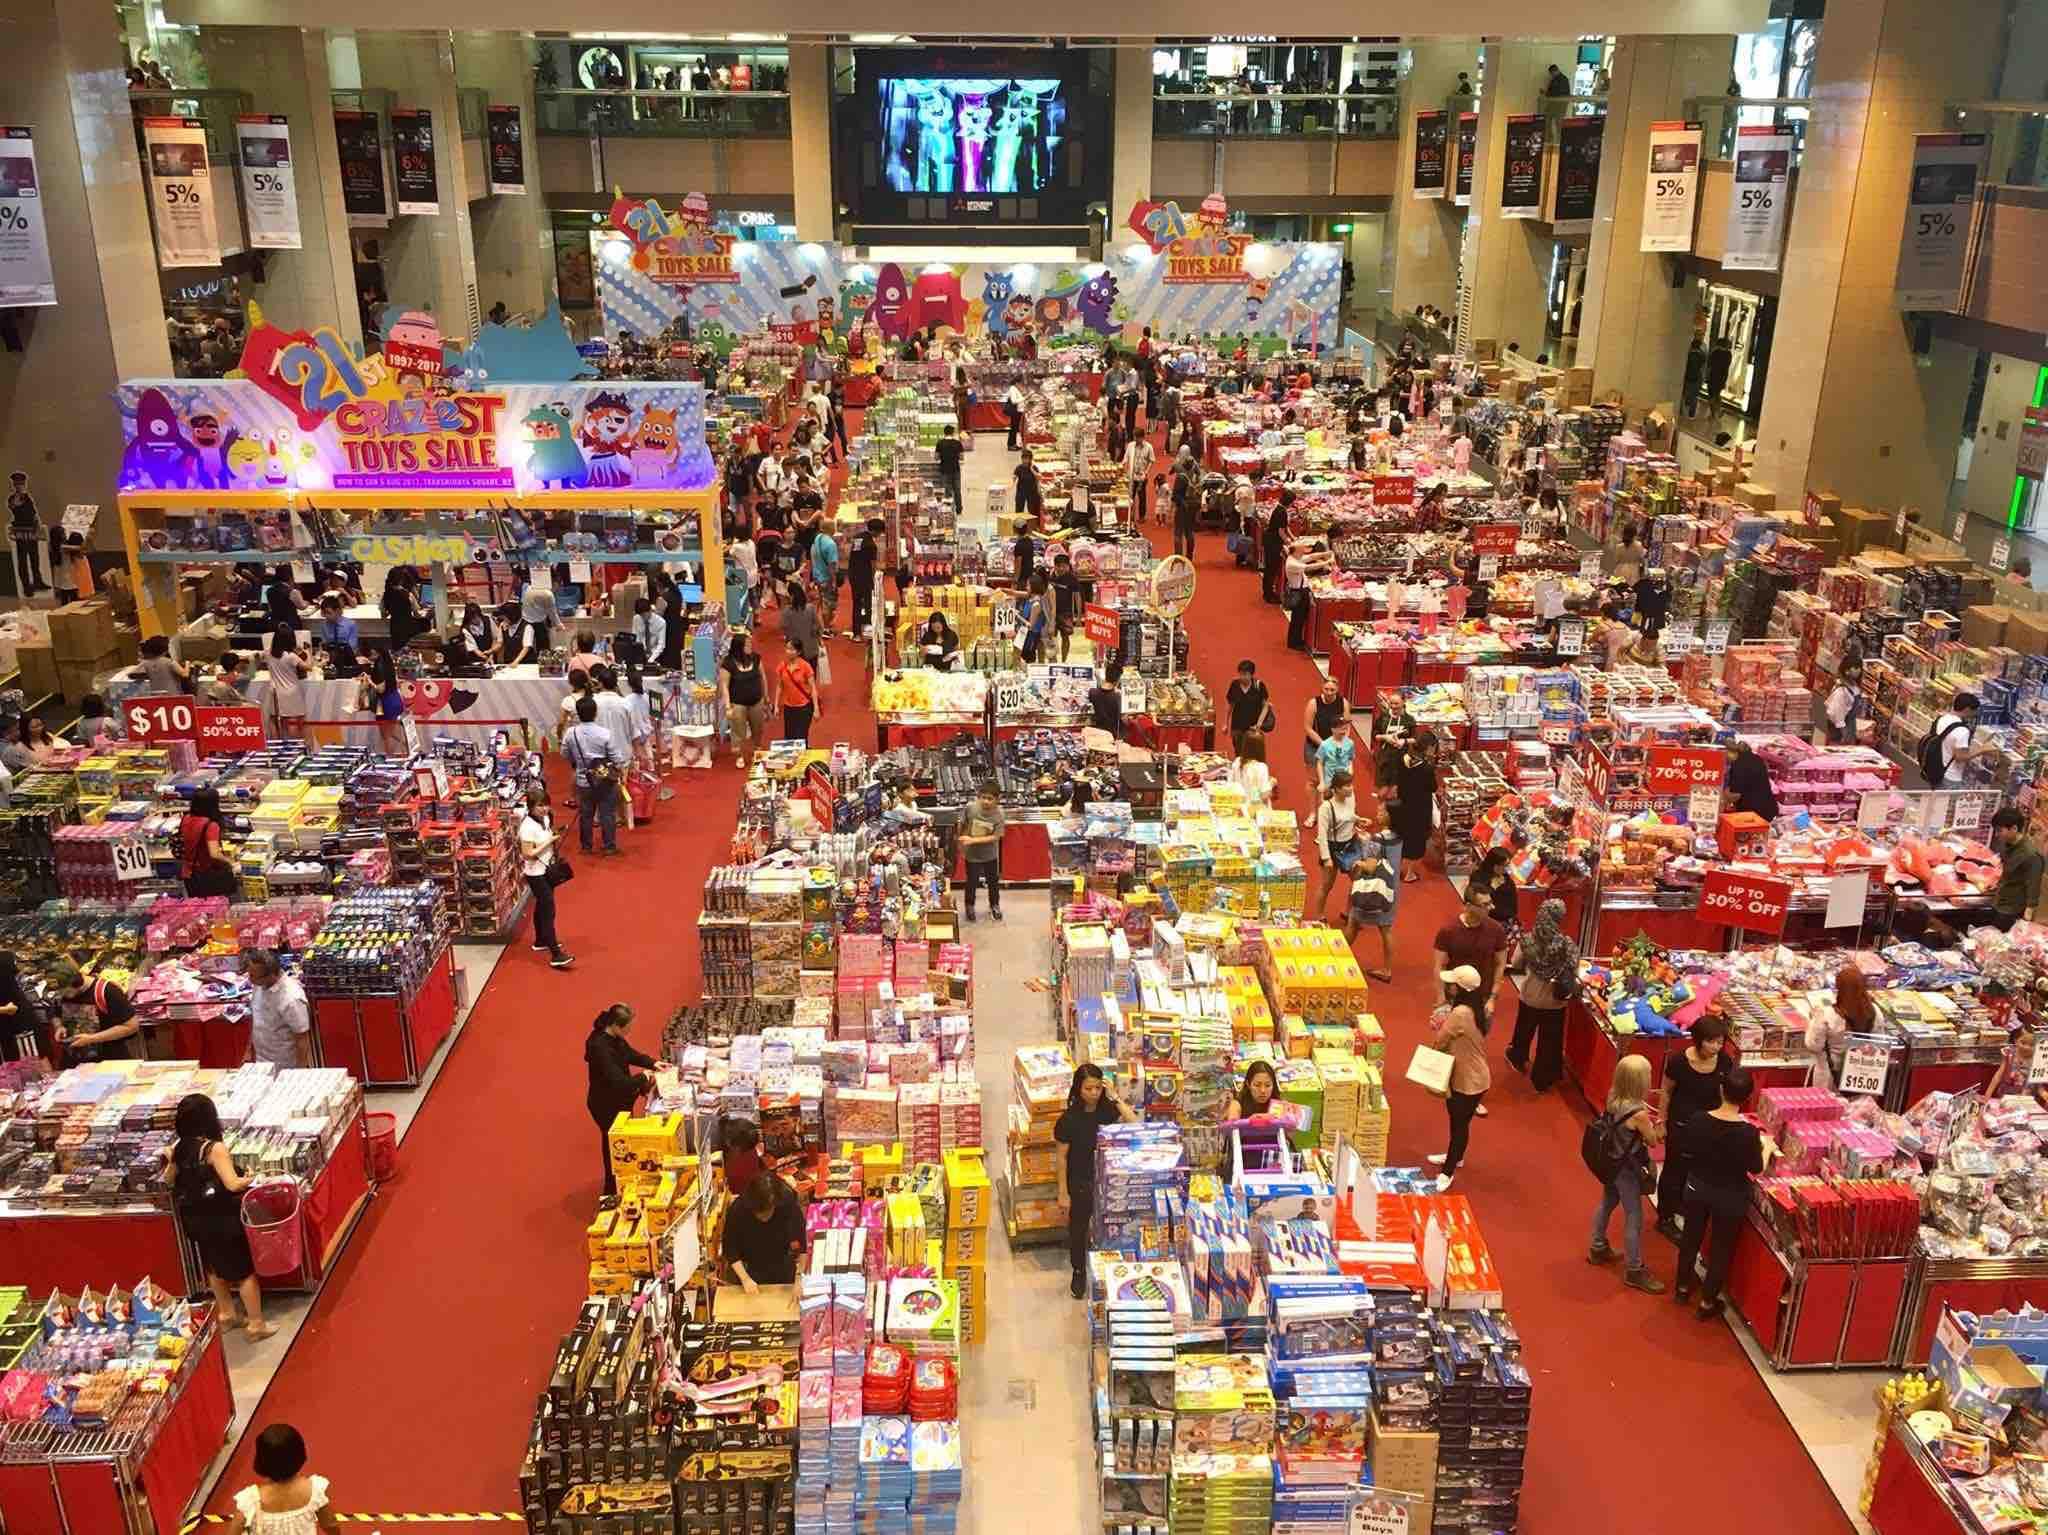 Takashimaya Singapore 21st Craziest Toys Sale Promotion 28 Jul - 6 Aug 2017   Why Not Deals & Promotions